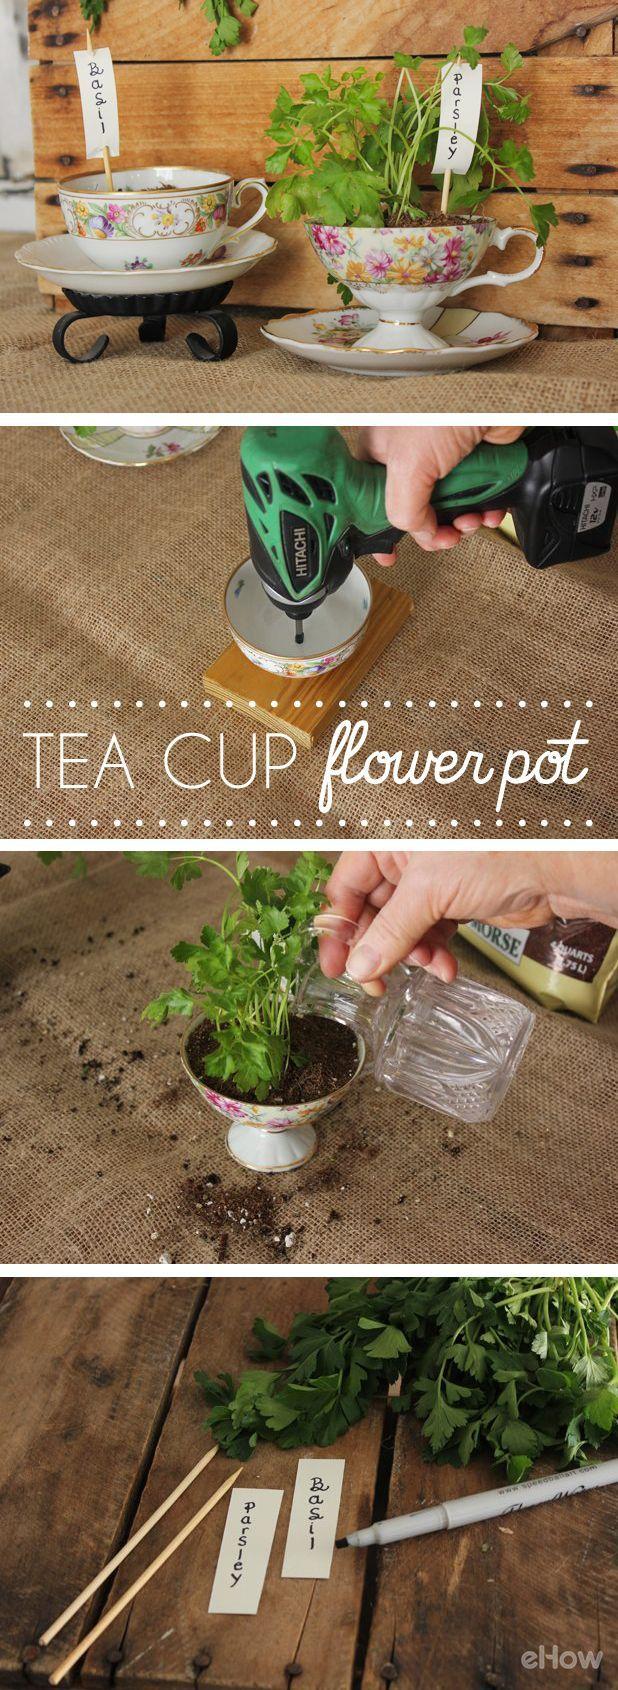 238 Best Images About Tea Cup Garden On Pinterest